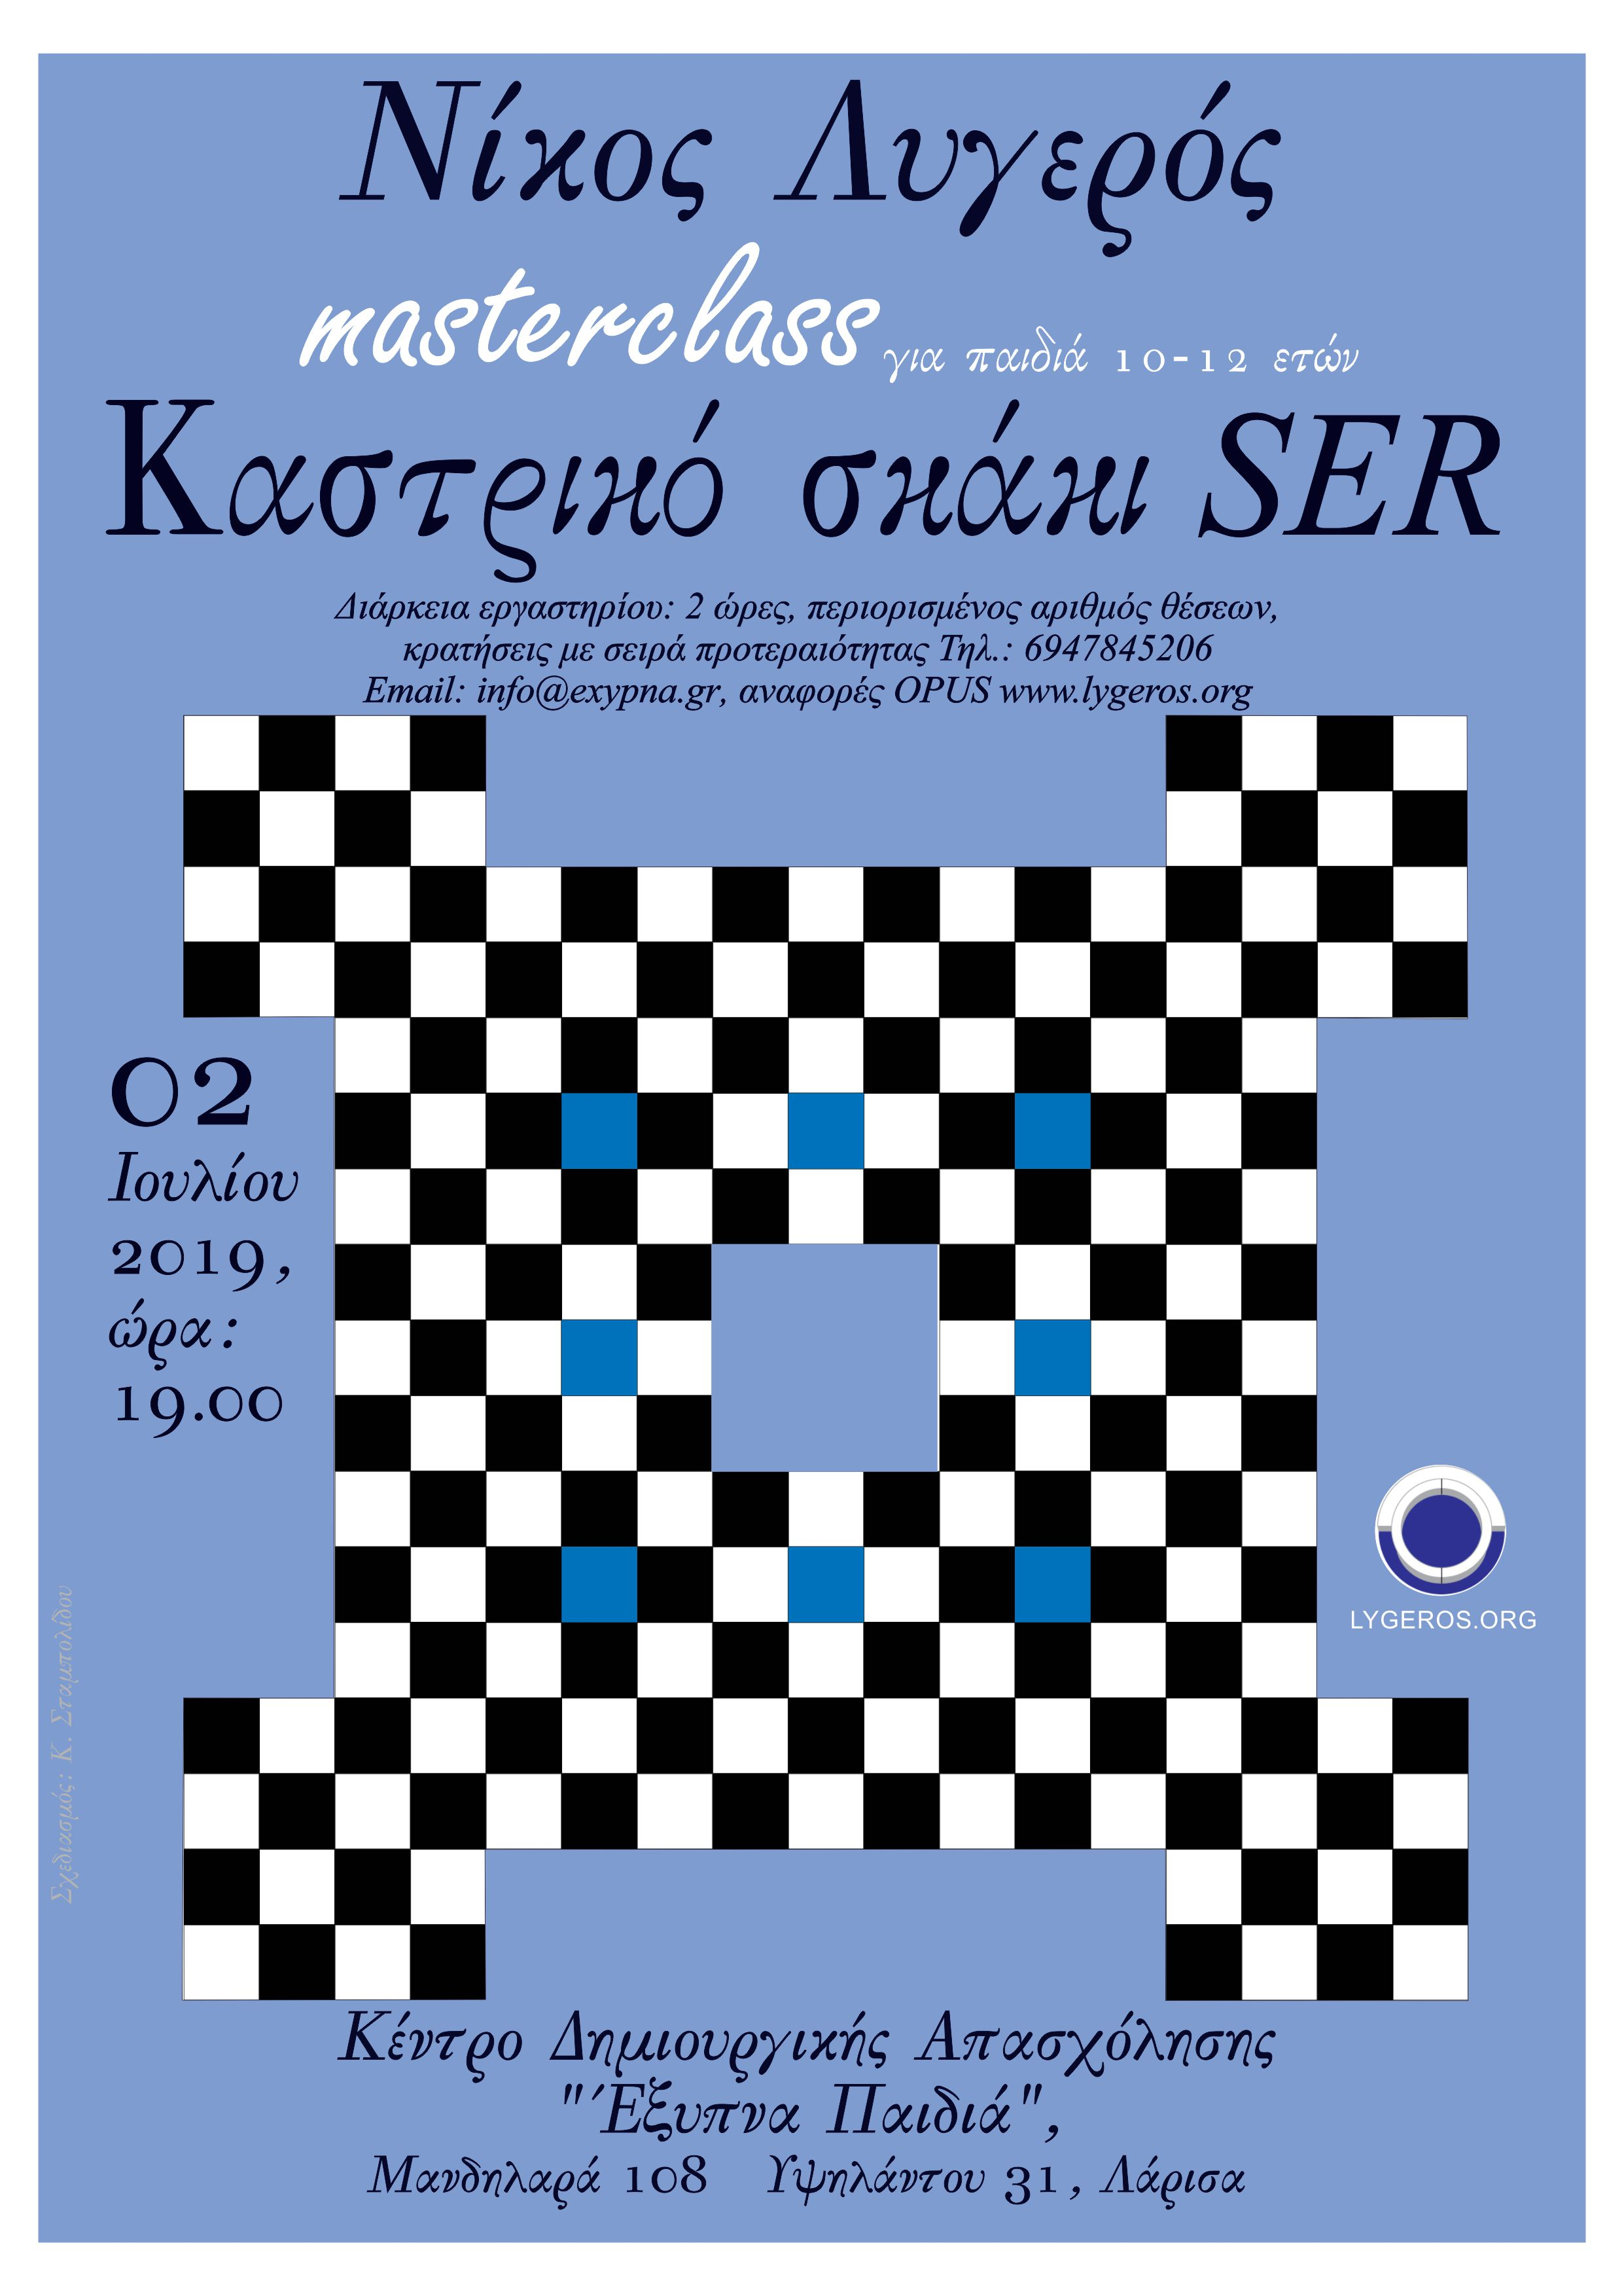 Masterclass: Καστρικό σκάκι SER